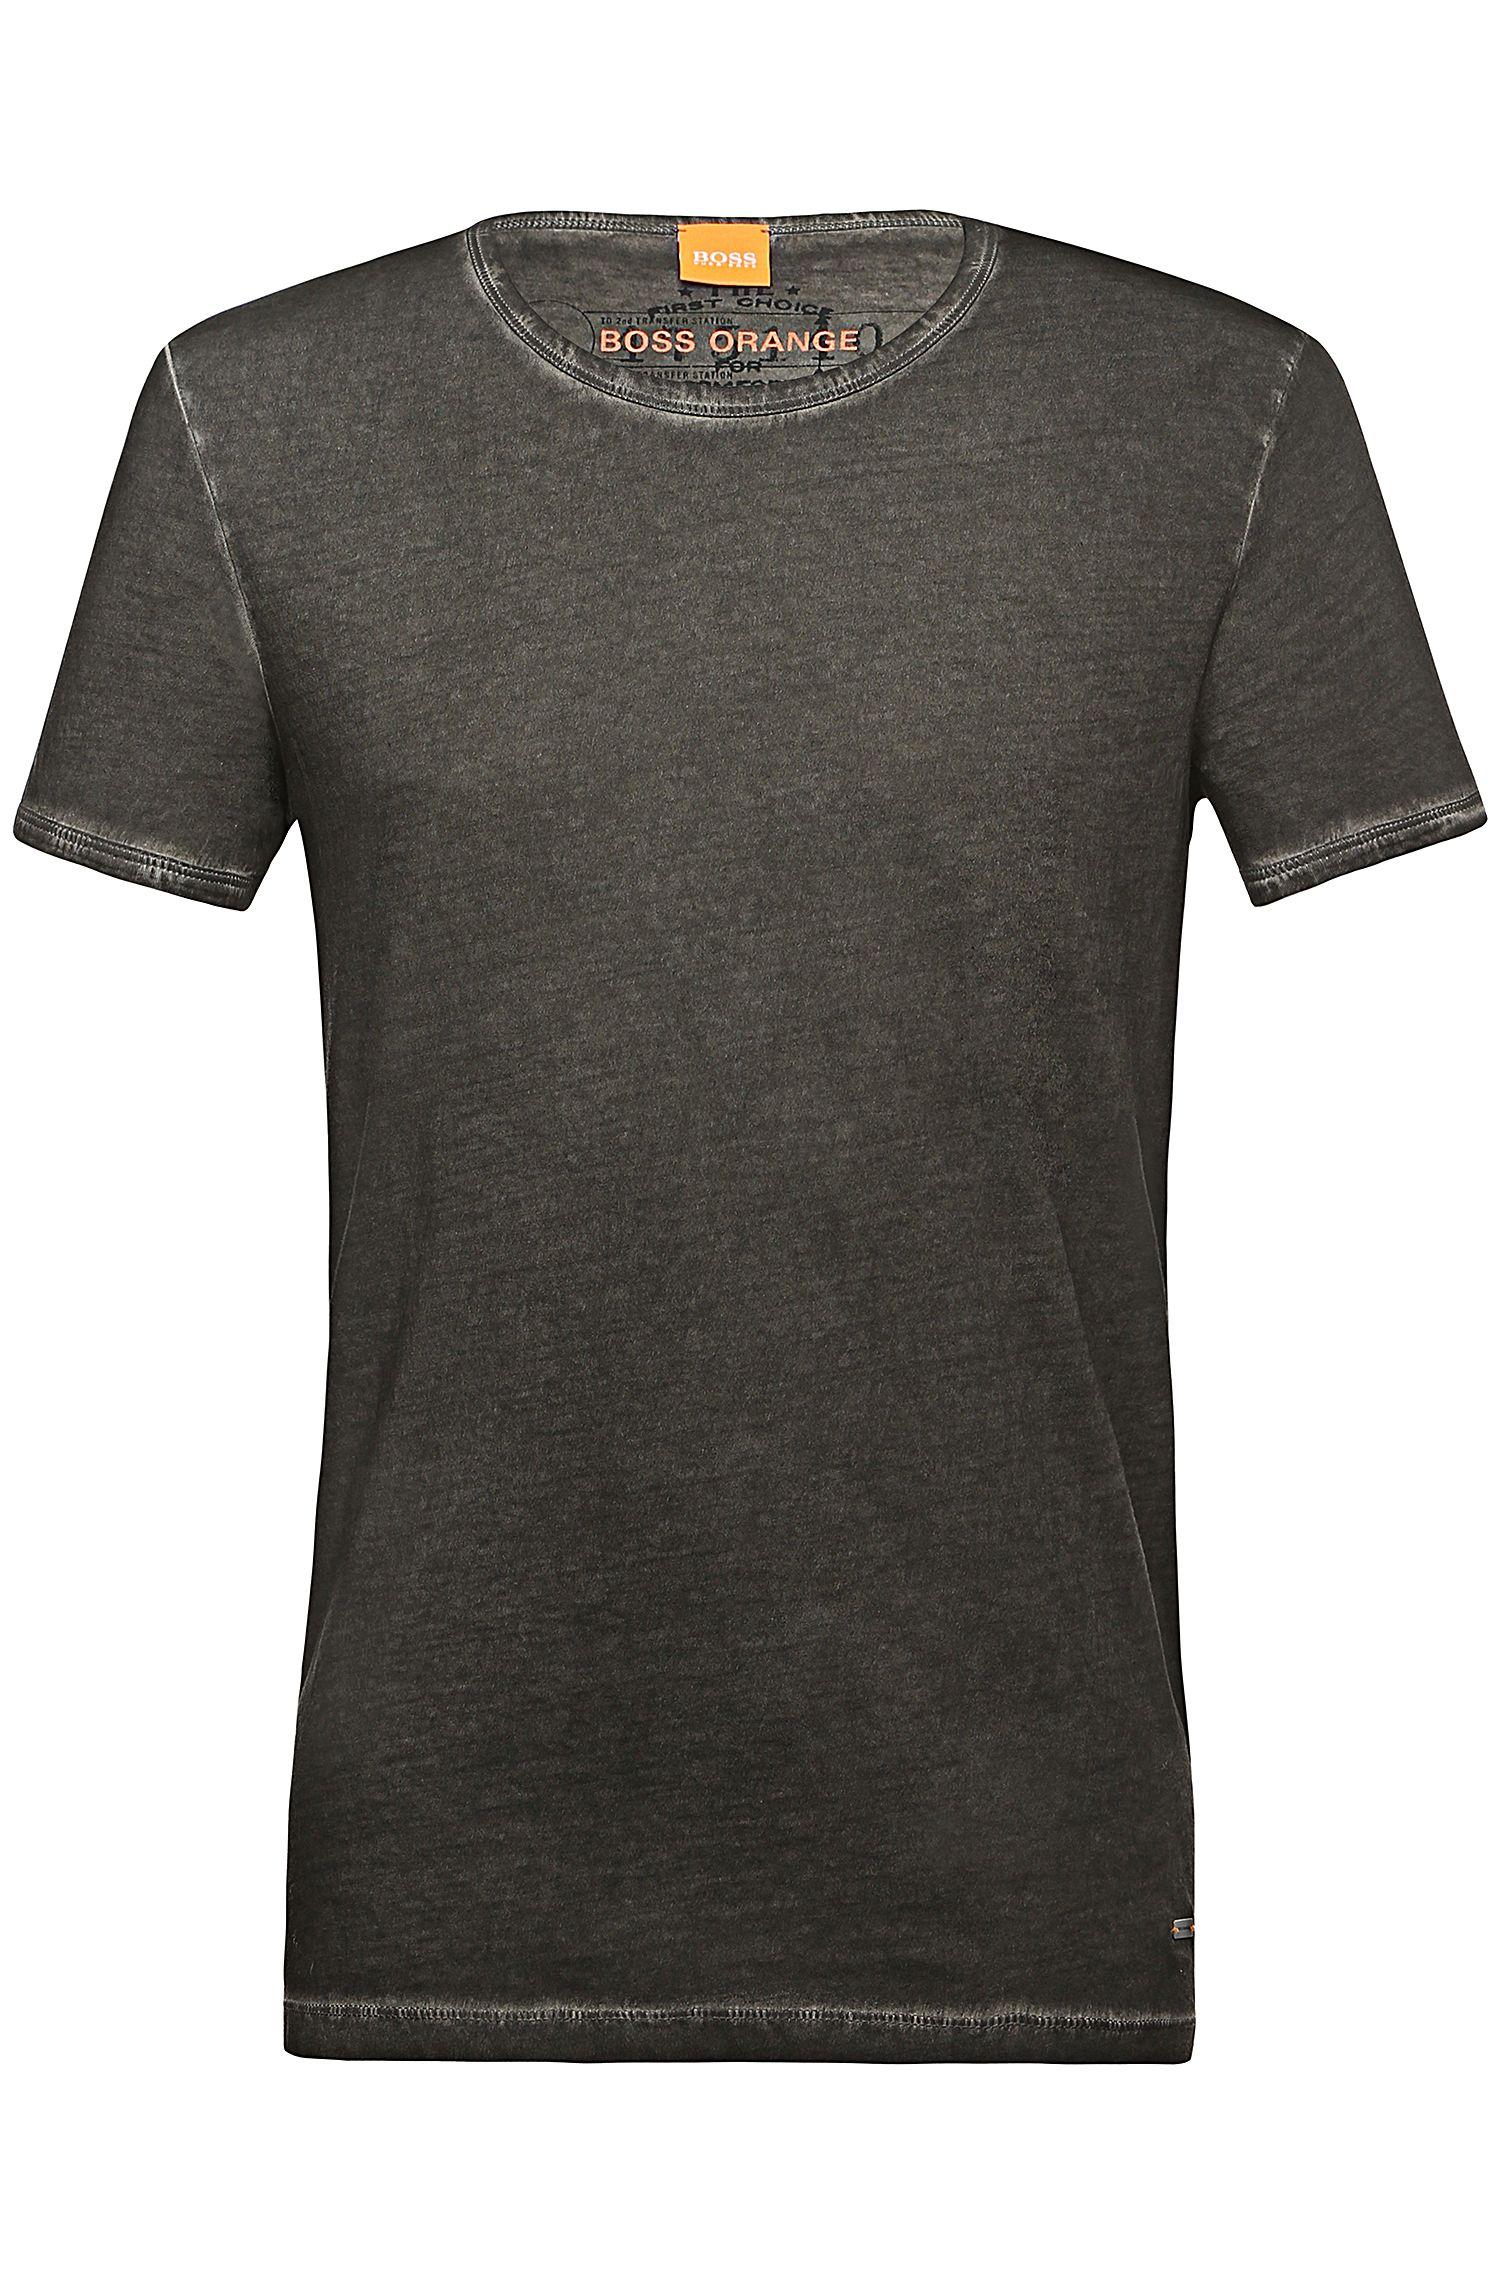 'Tour' | Cotton Garment Washed T-Shirt